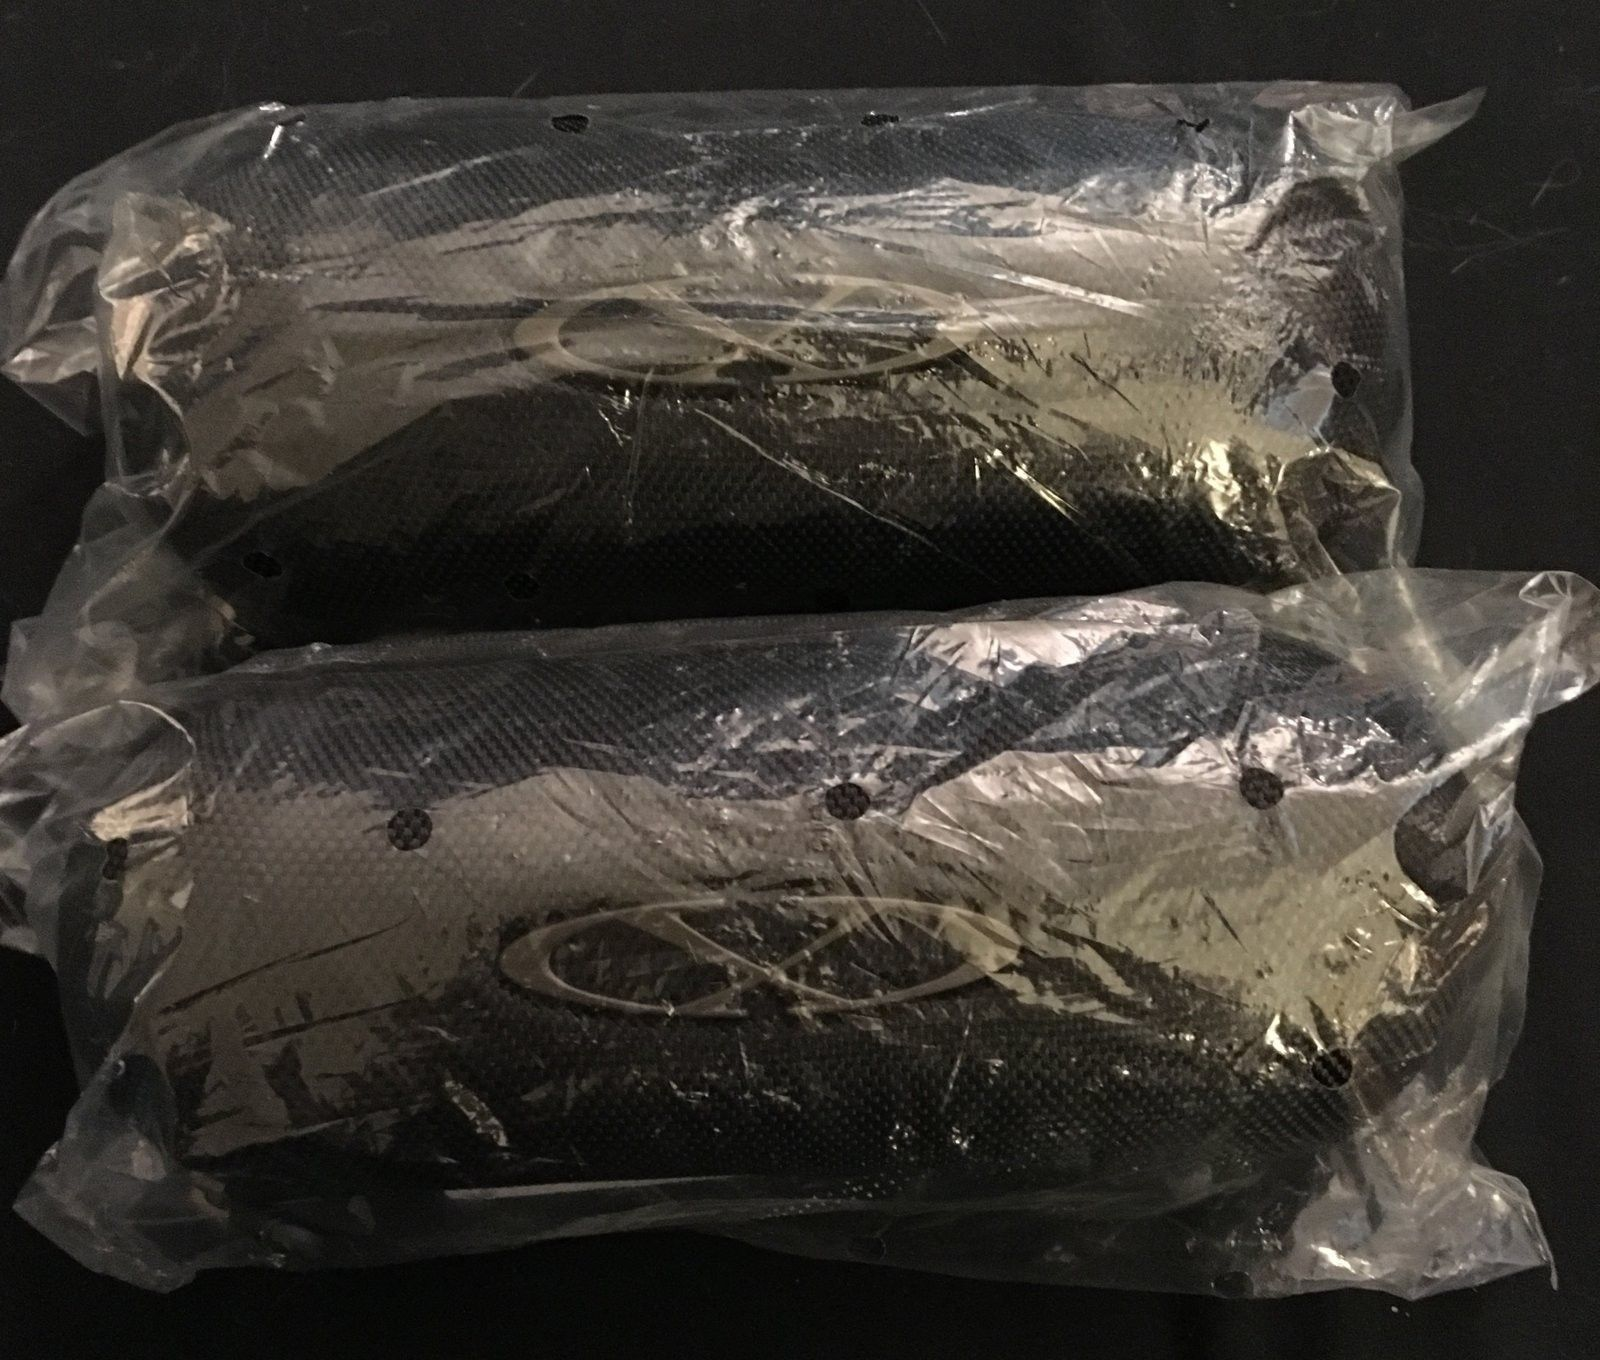 Two new x-metal soft vaults - image.jpeg